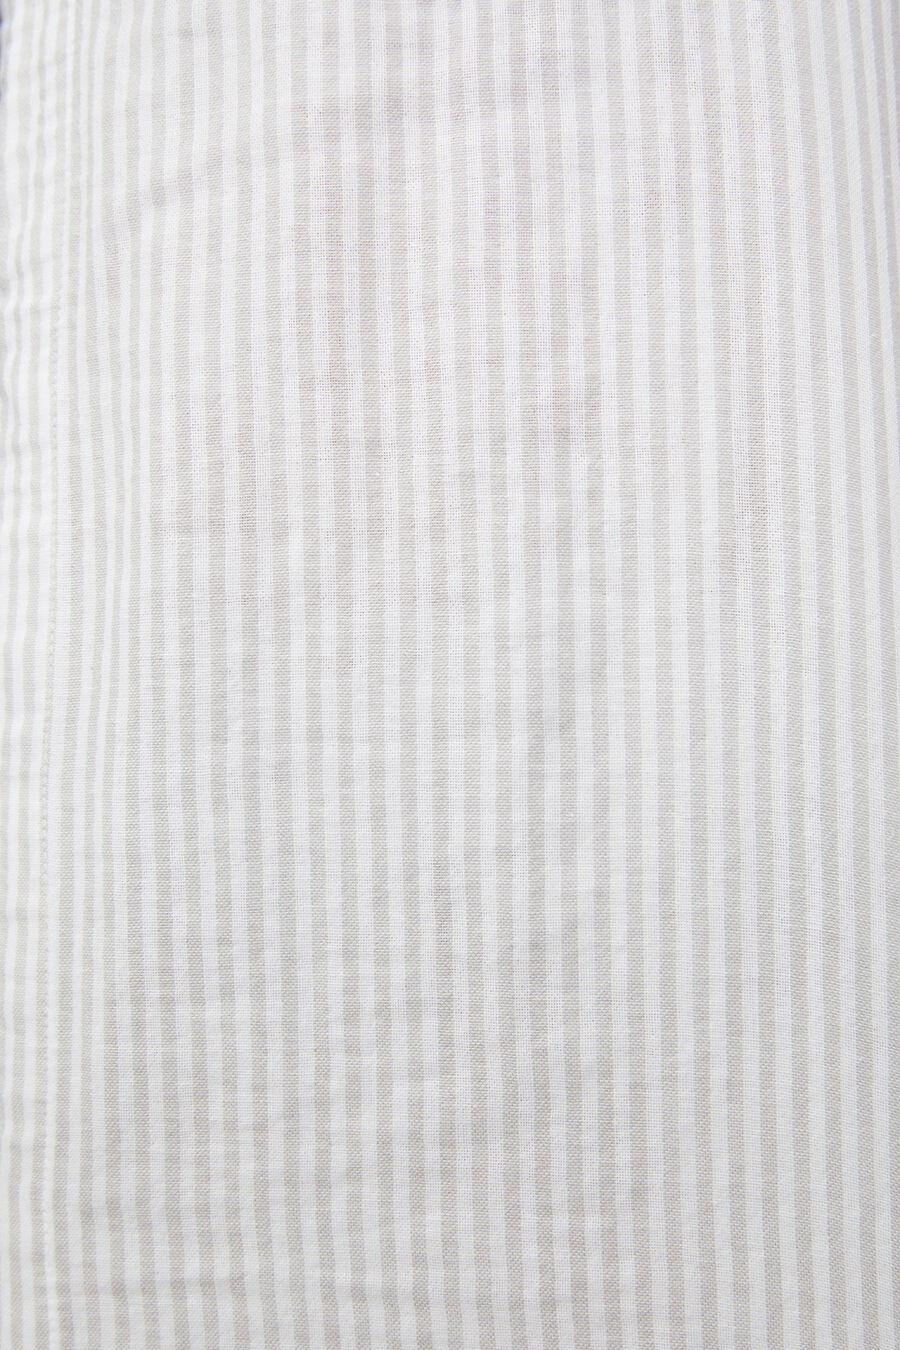 Raven Stripe PJ Set - Image 5 of 6